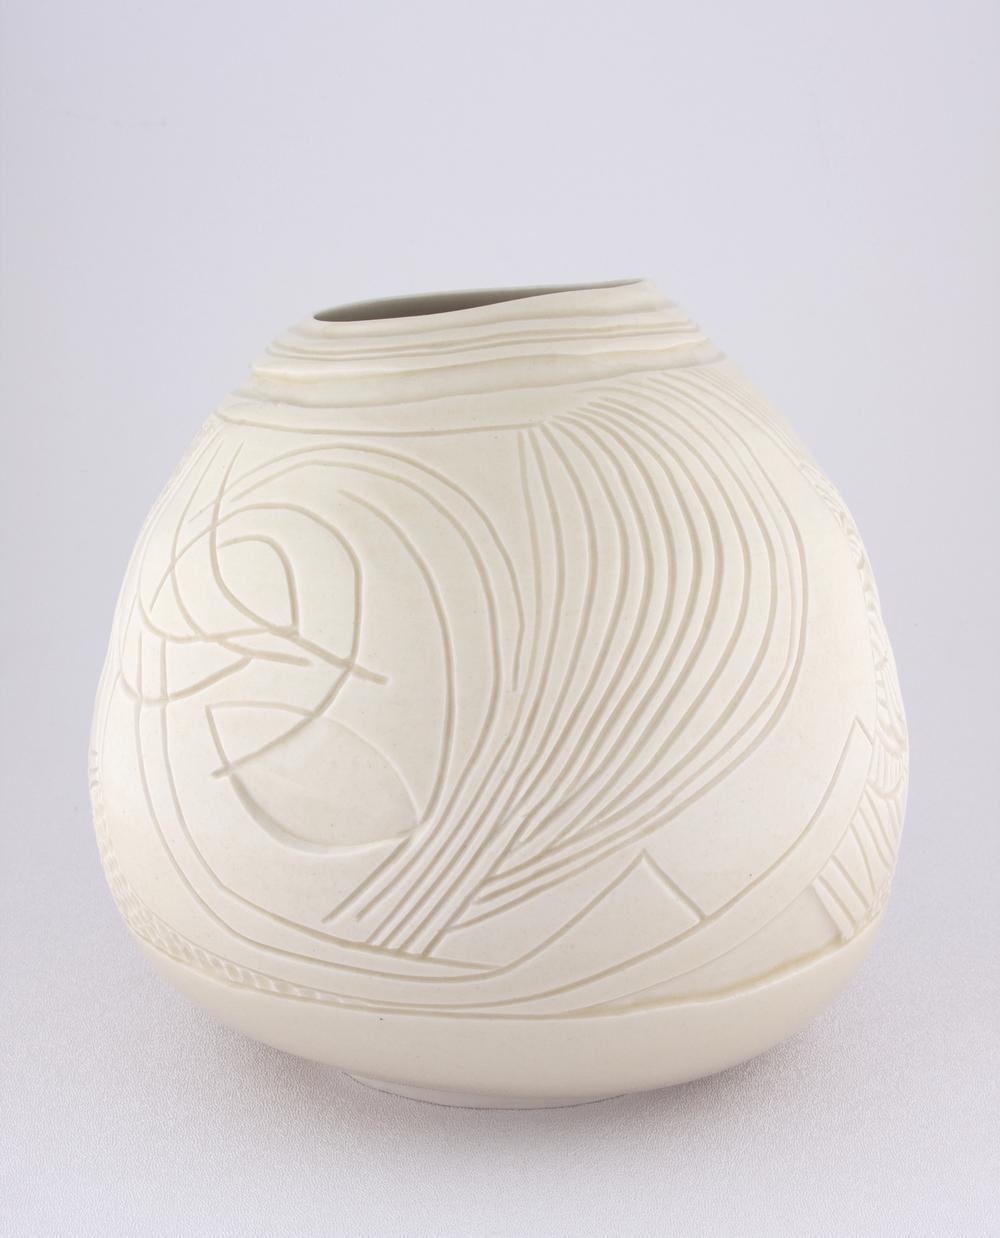 Shio Kusaka  Untitled (freestyle 2)  2008 Porcelain 7 1/2h x 7 1/4w x 7 1/4d in SK047